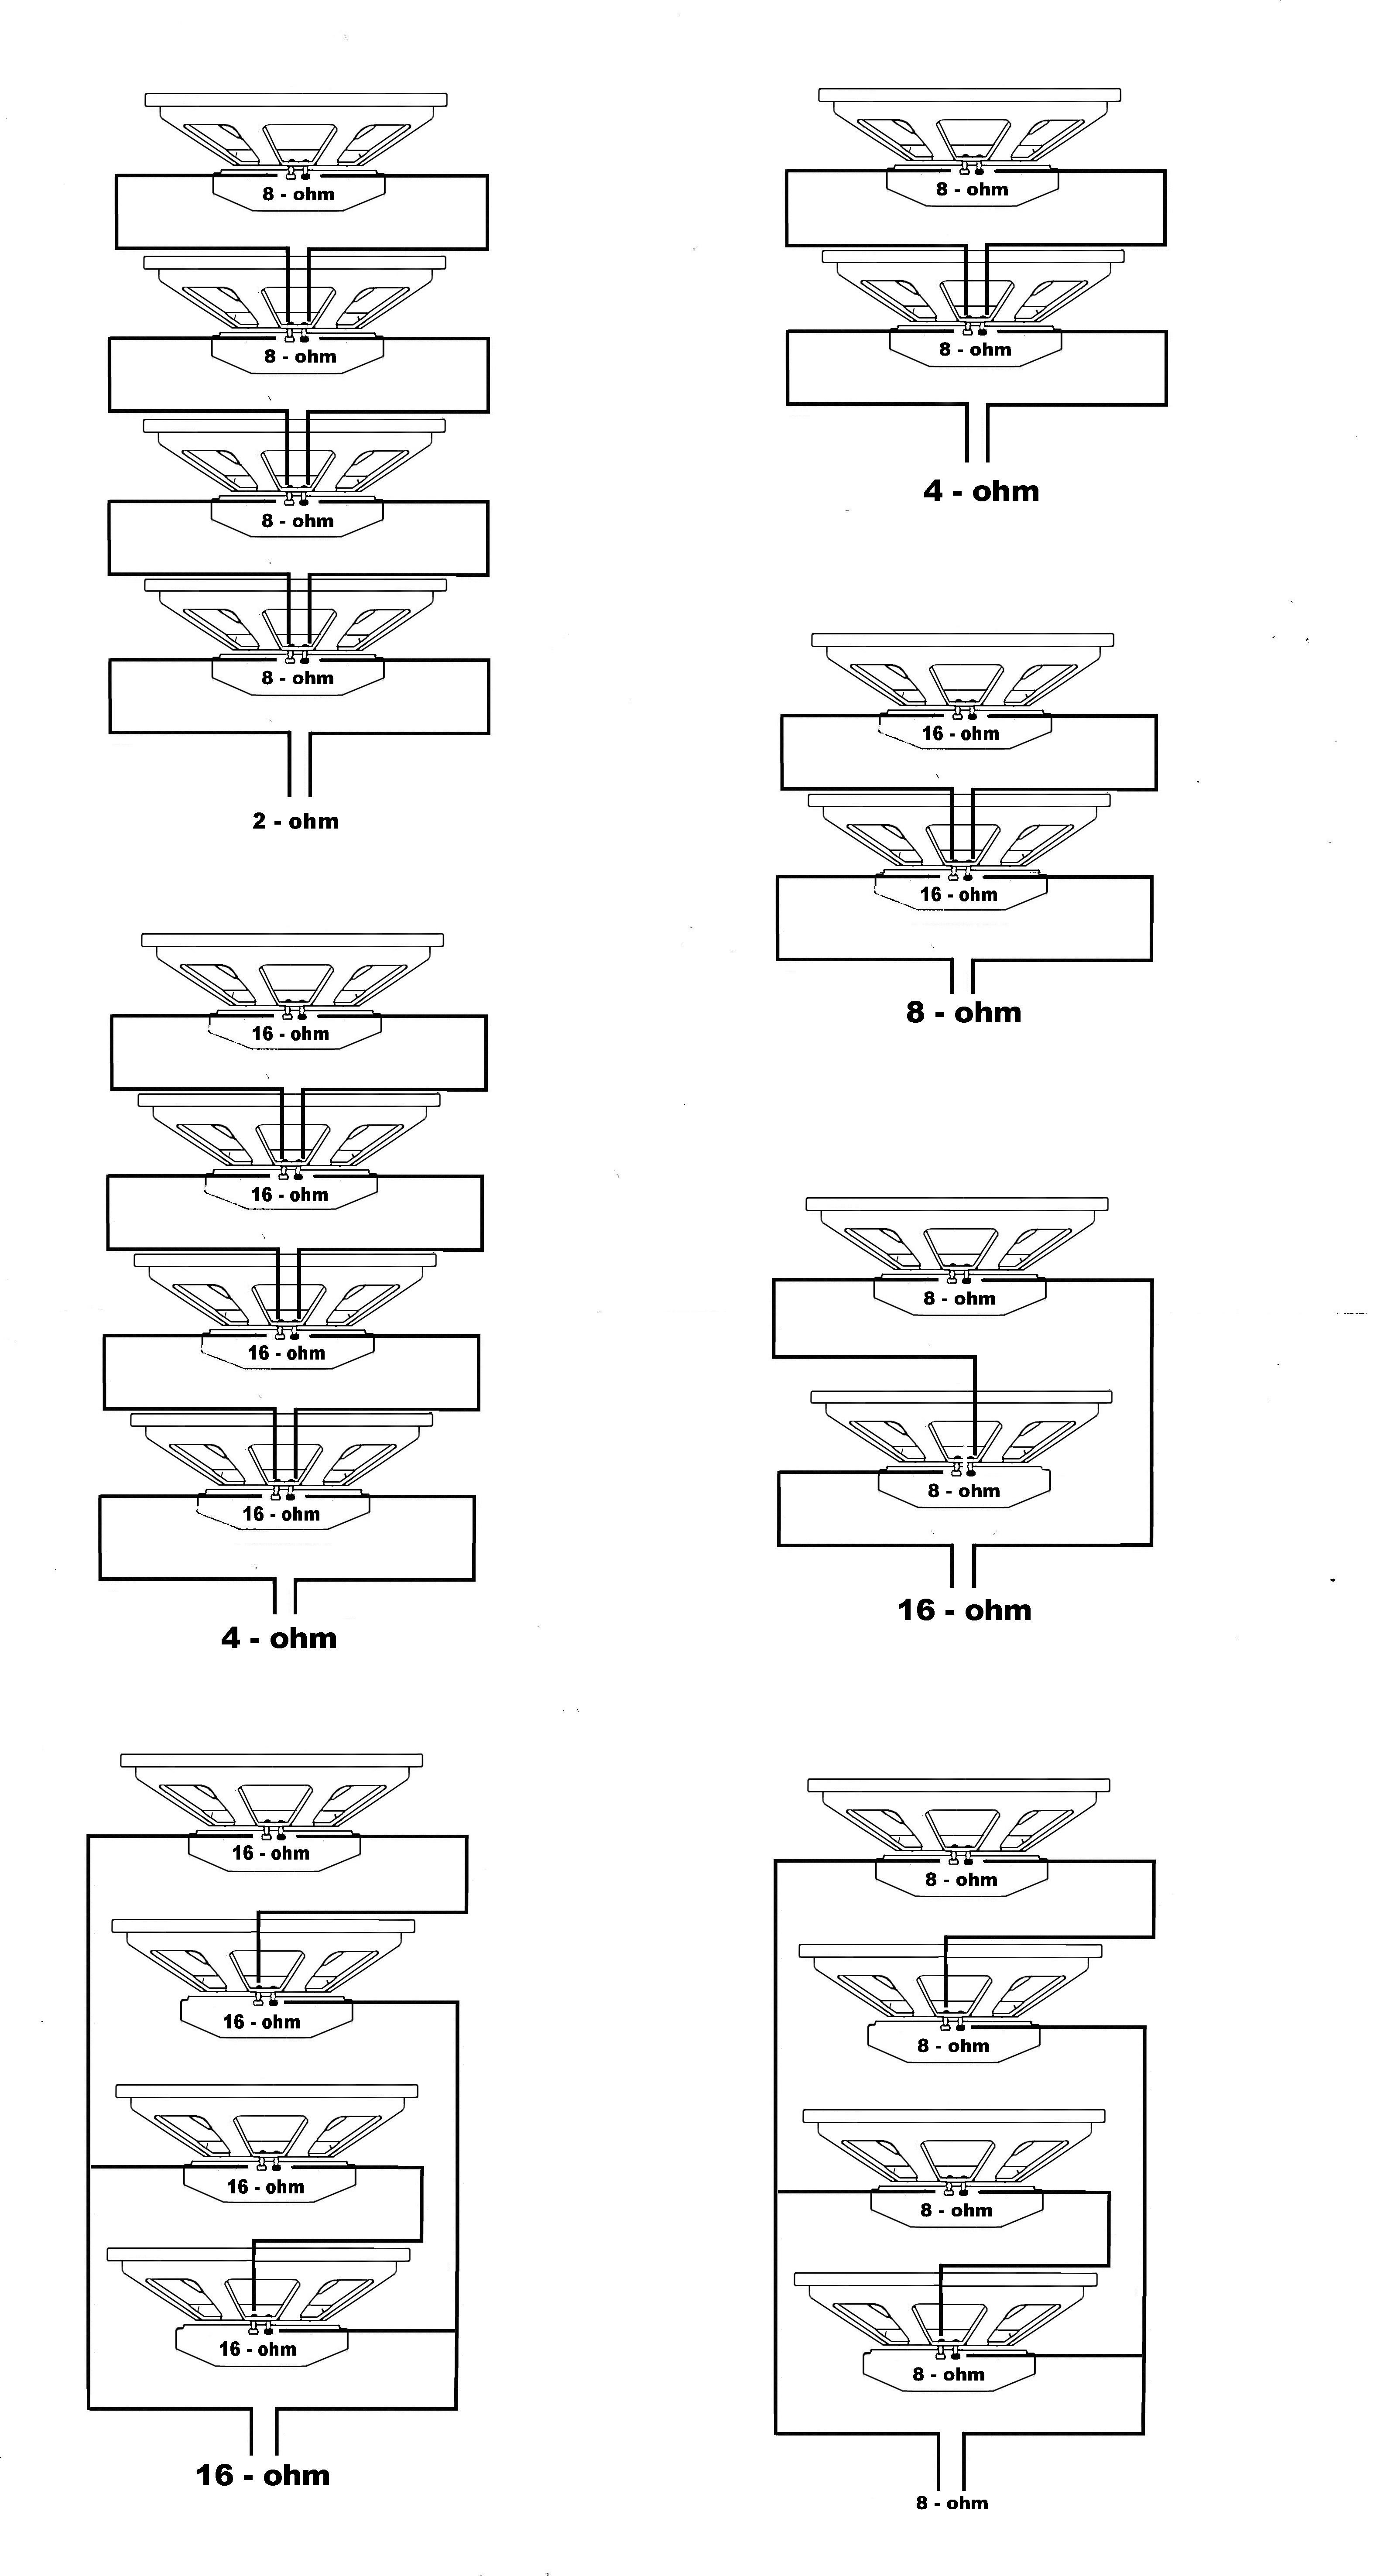 Sammy Bones Wiring Diagrams For Guitar Amps At 2X12 Diagram 2x12